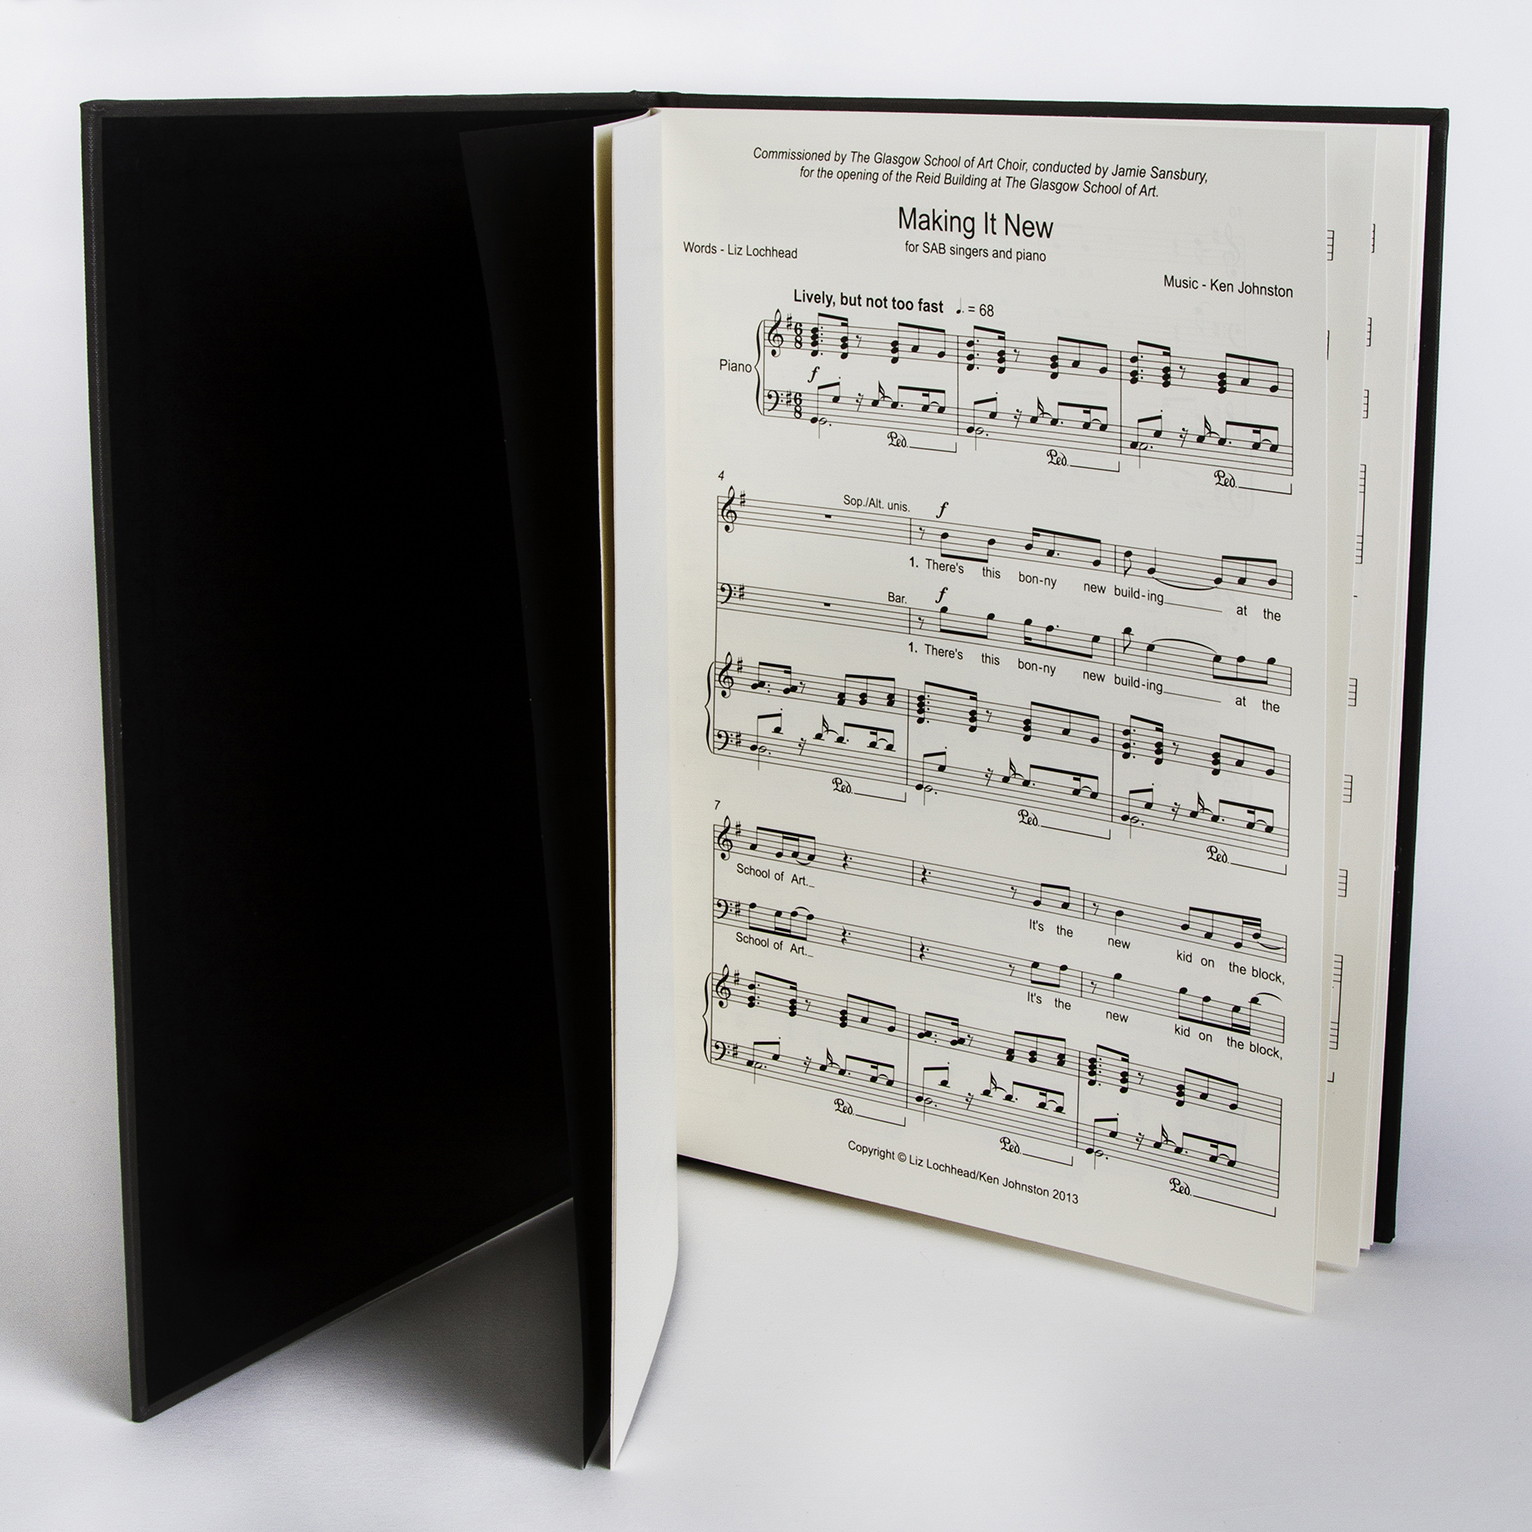 'Making It New' commemorative score